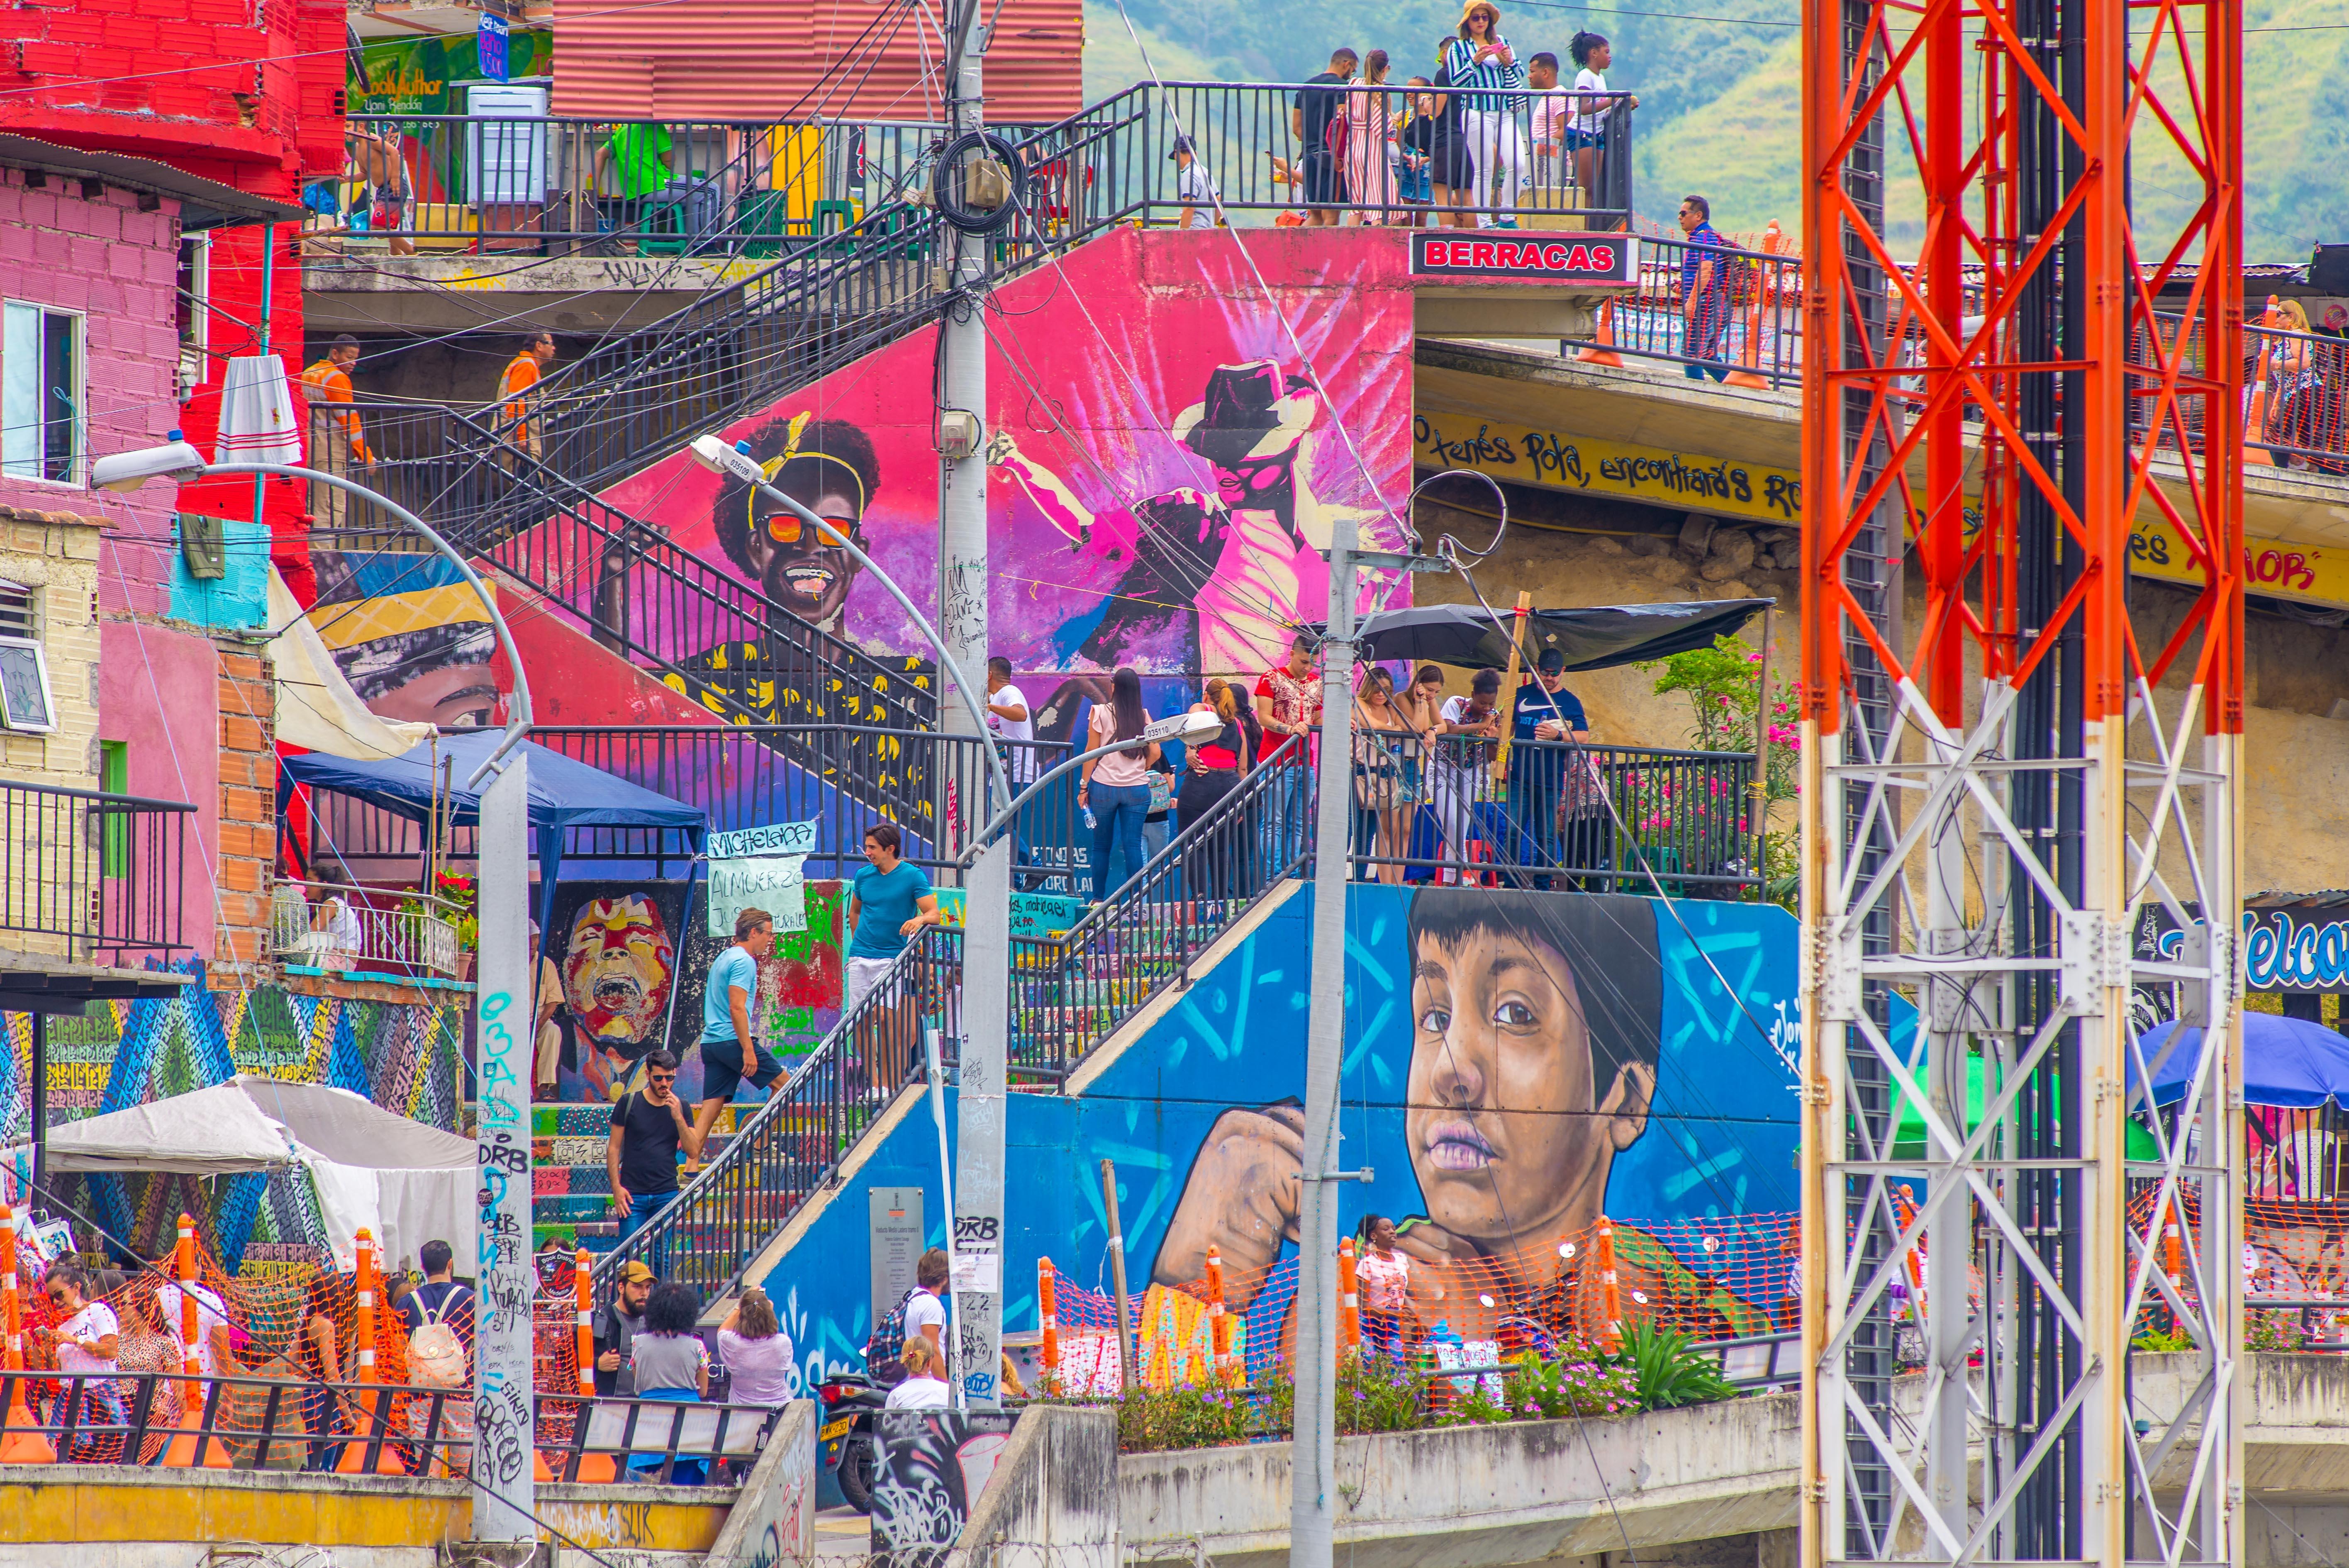 Comuna 13 Street Art Medellin Colombie Blog de Voyage Blog Voyage Trois semaines en Colombie